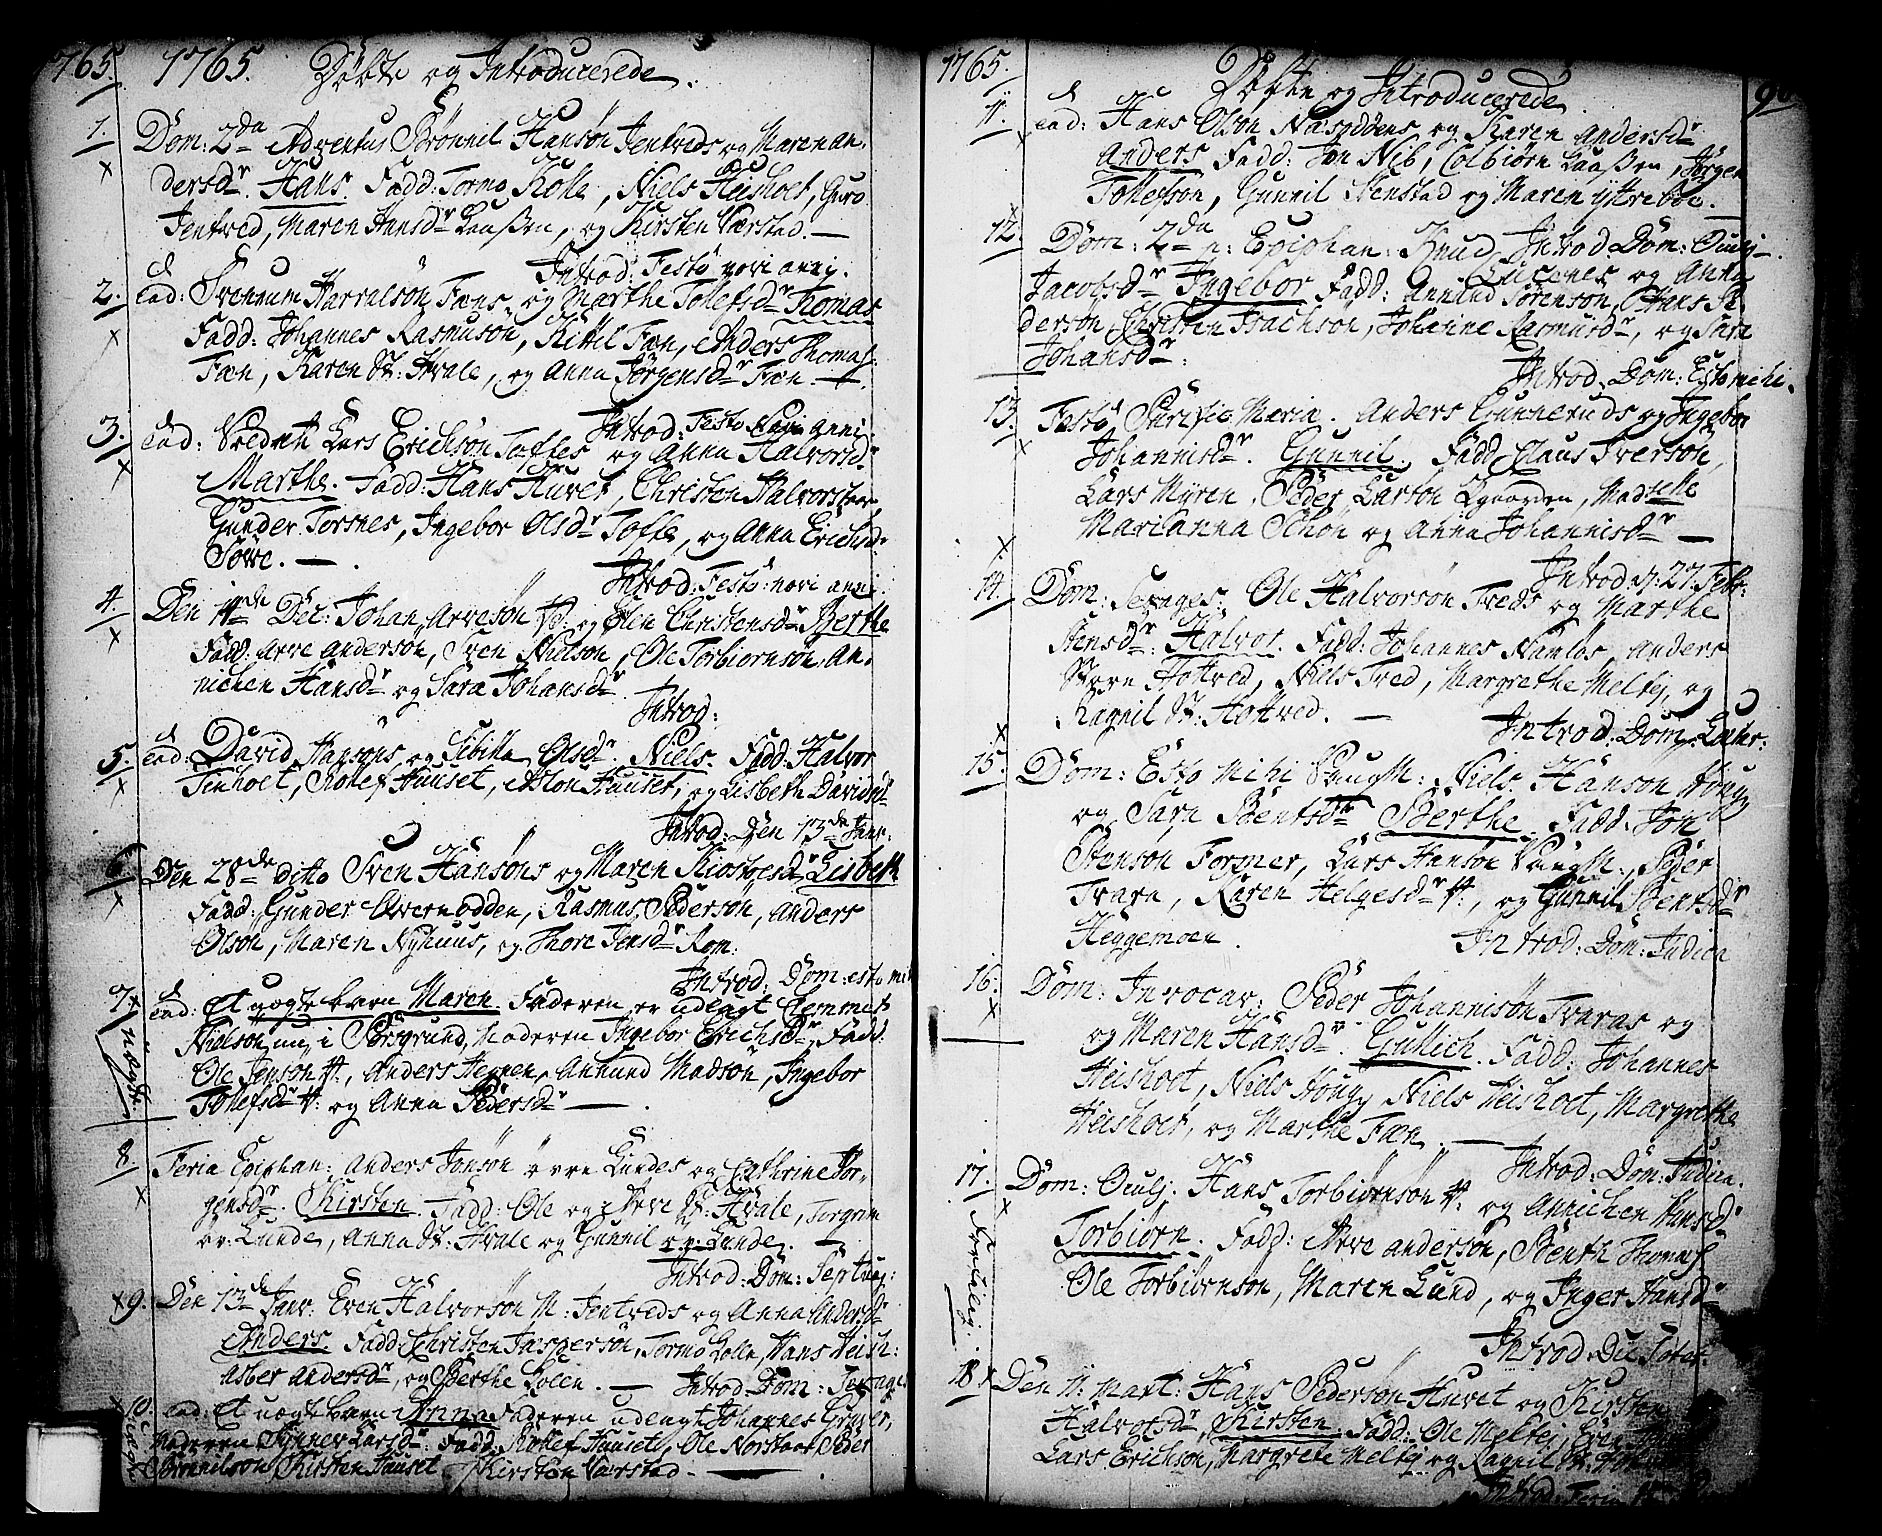 SAKO, Holla kirkebøker, F/Fa/L0001: Ministerialbok nr. 1, 1717-1779, s. 96